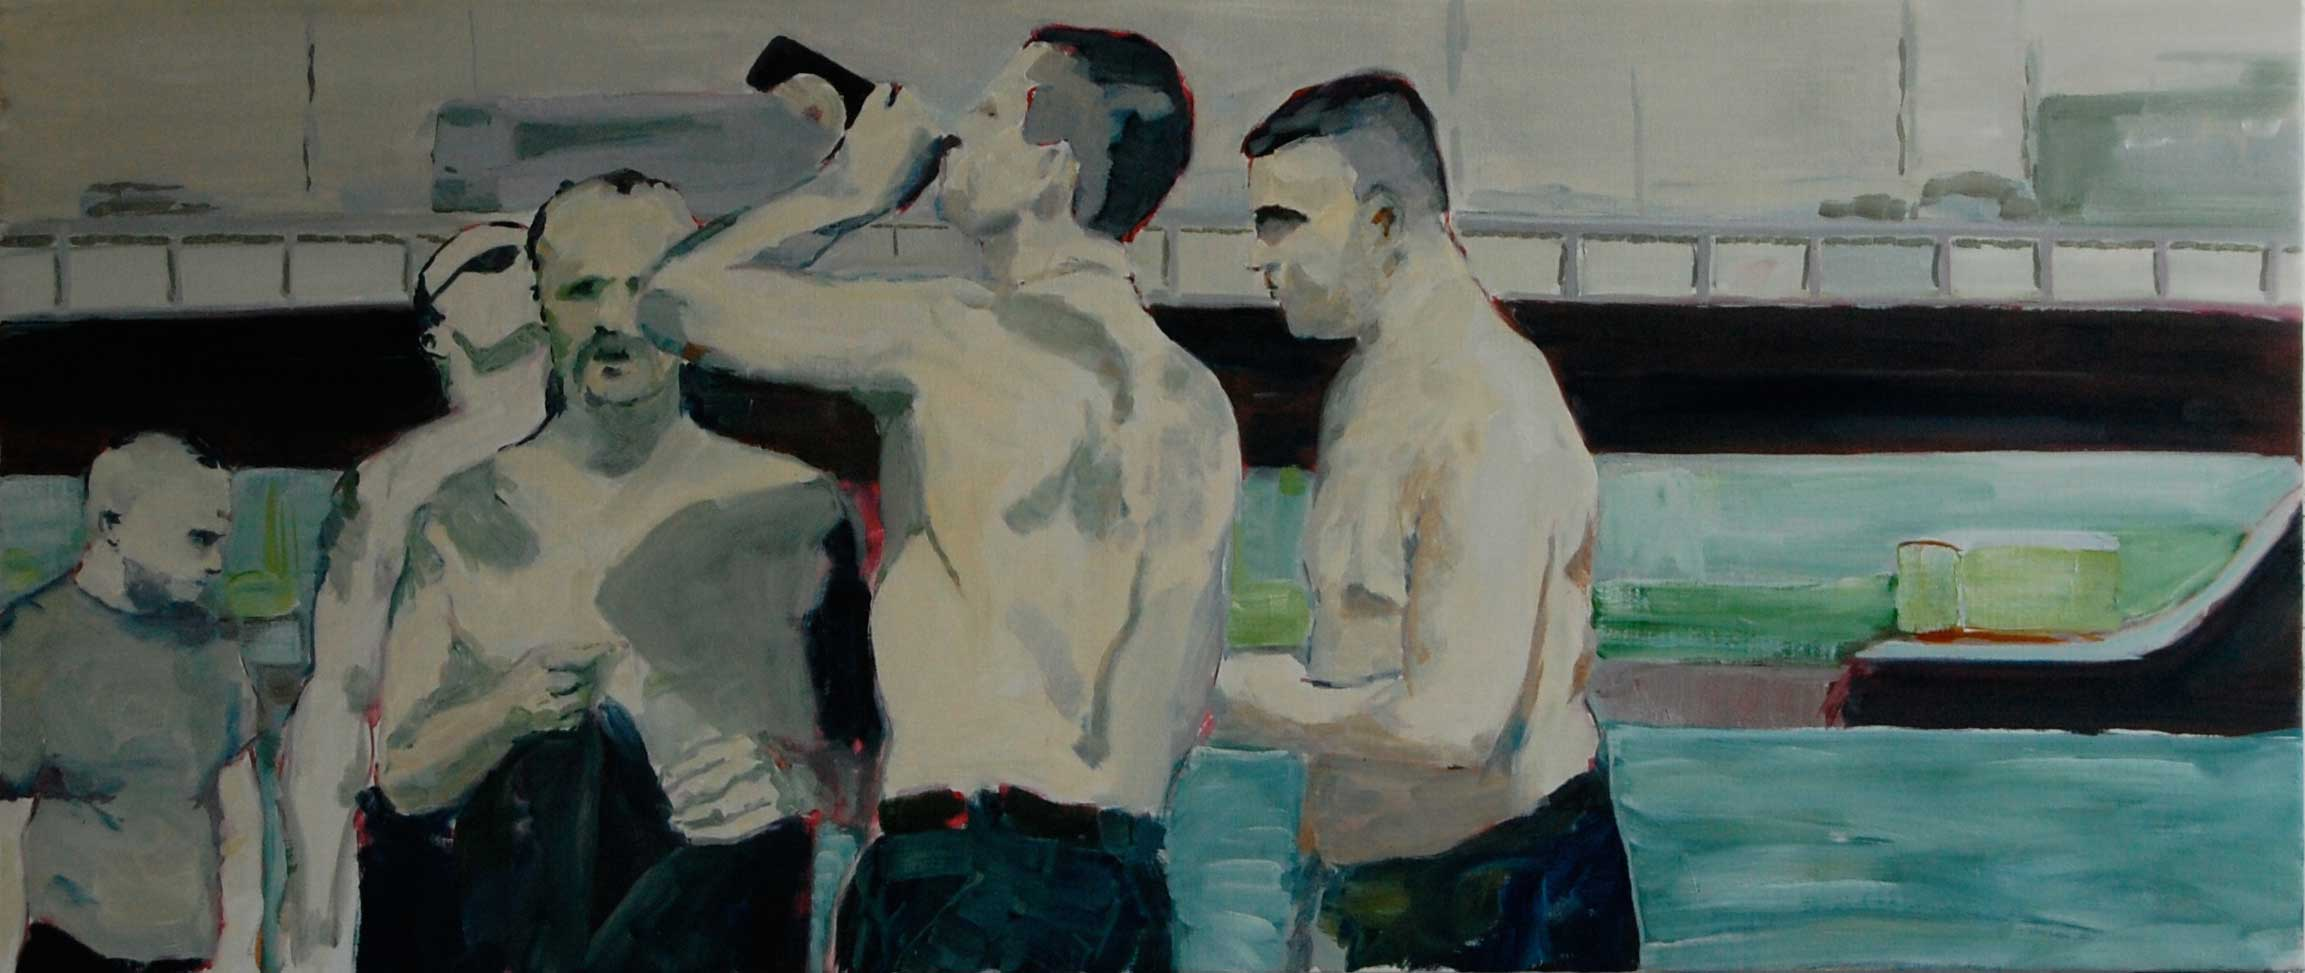 Freizeit - an unbelievably good painting by Bart Vinckier